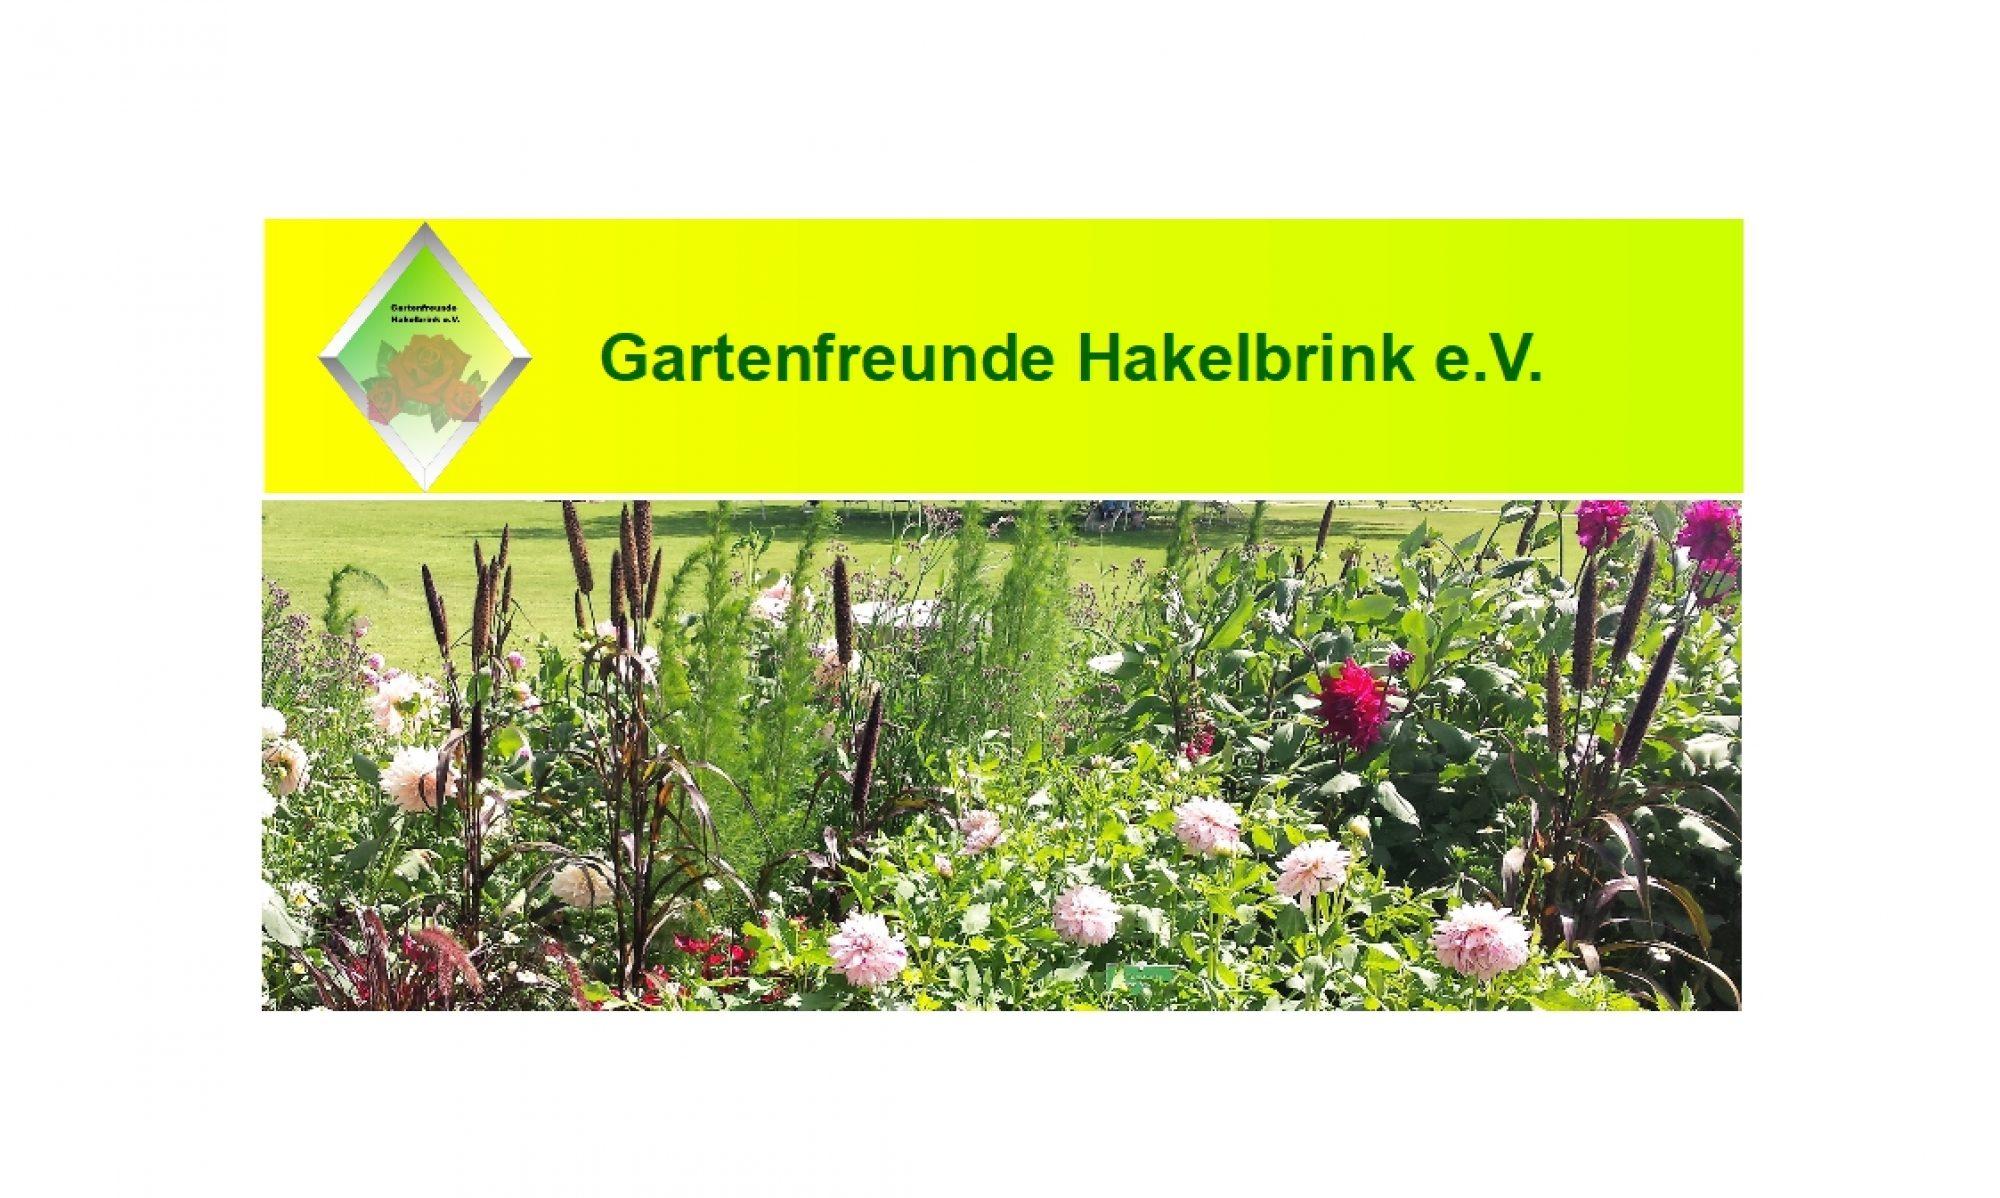 Gartenfreunde Hakelbrink e. V.